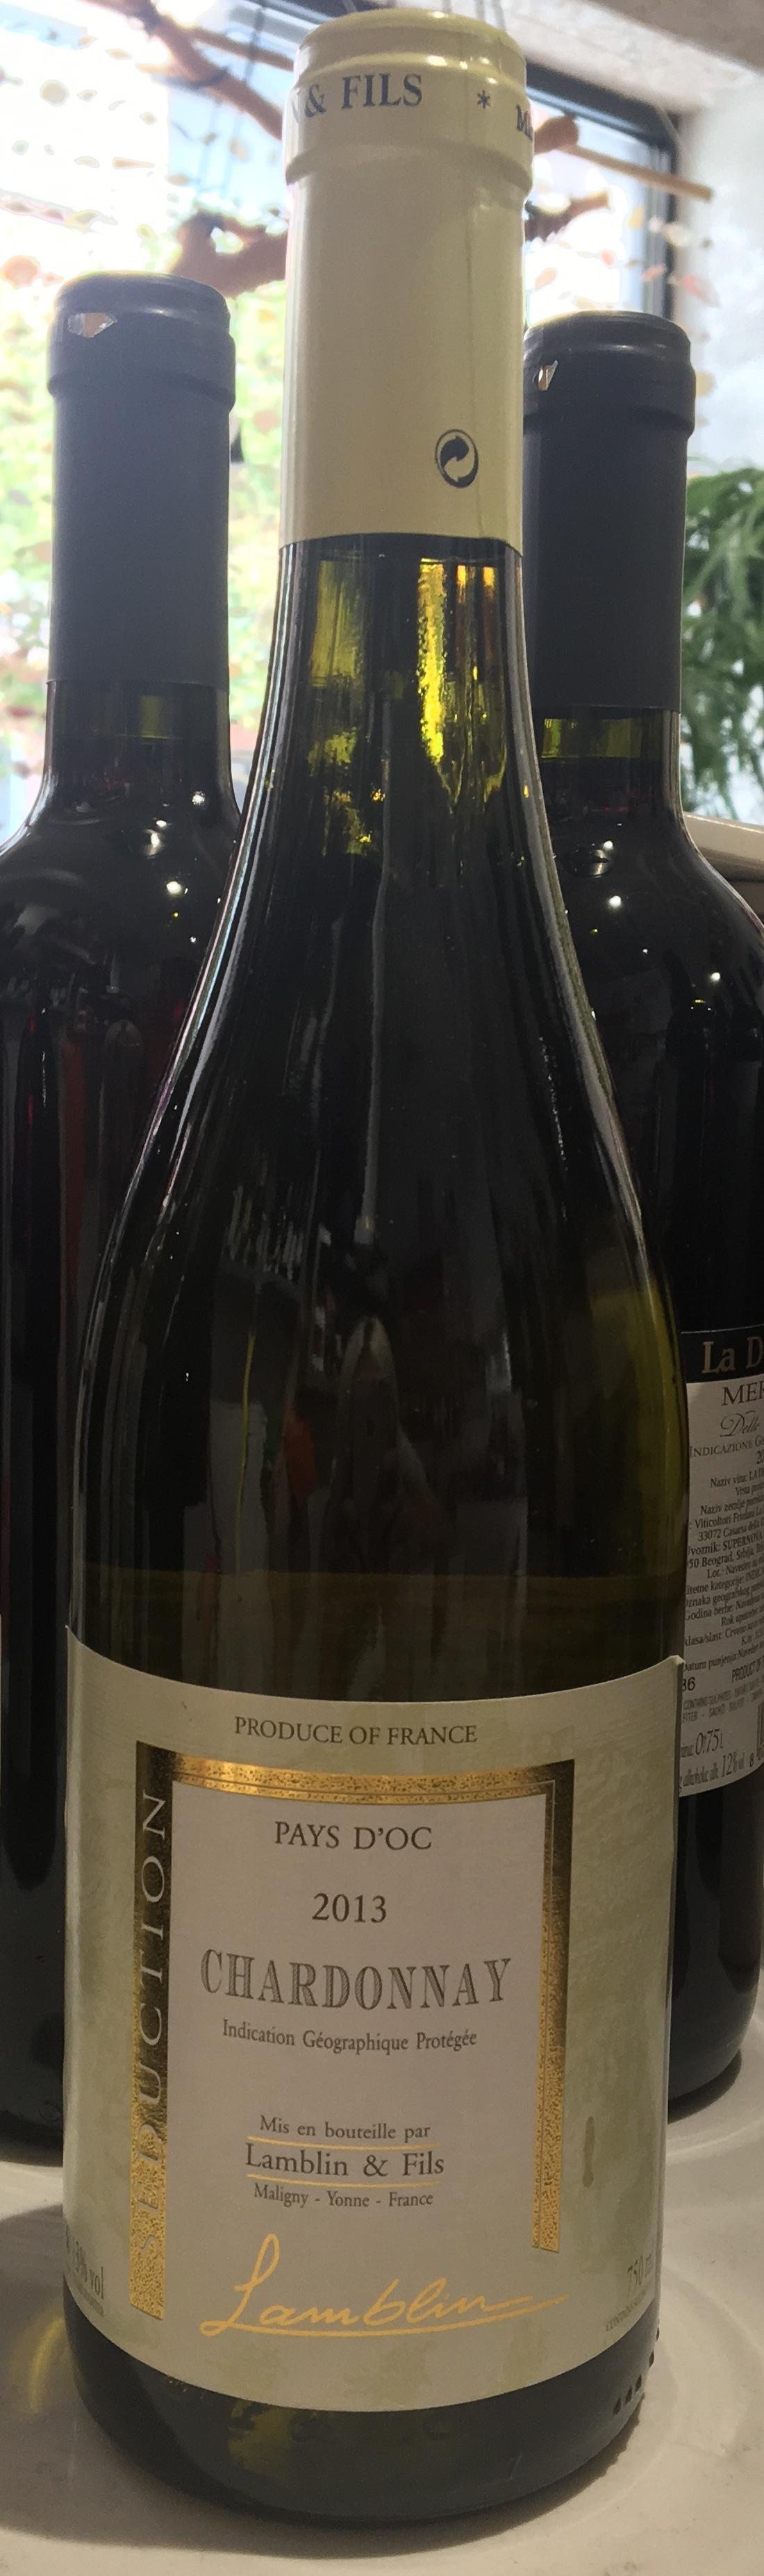 Lamblin - Chardonnay